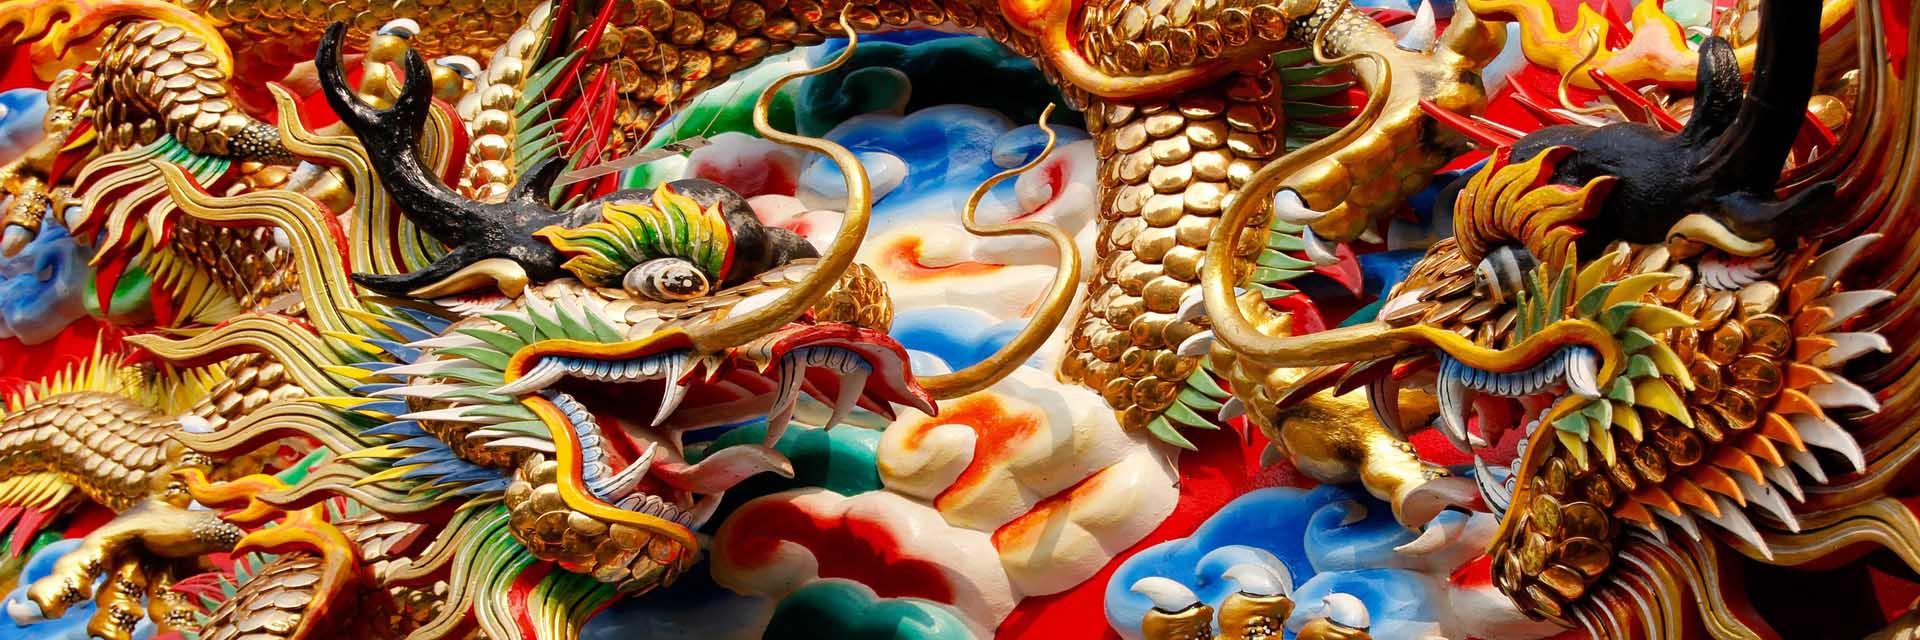 thailand--cultural-art